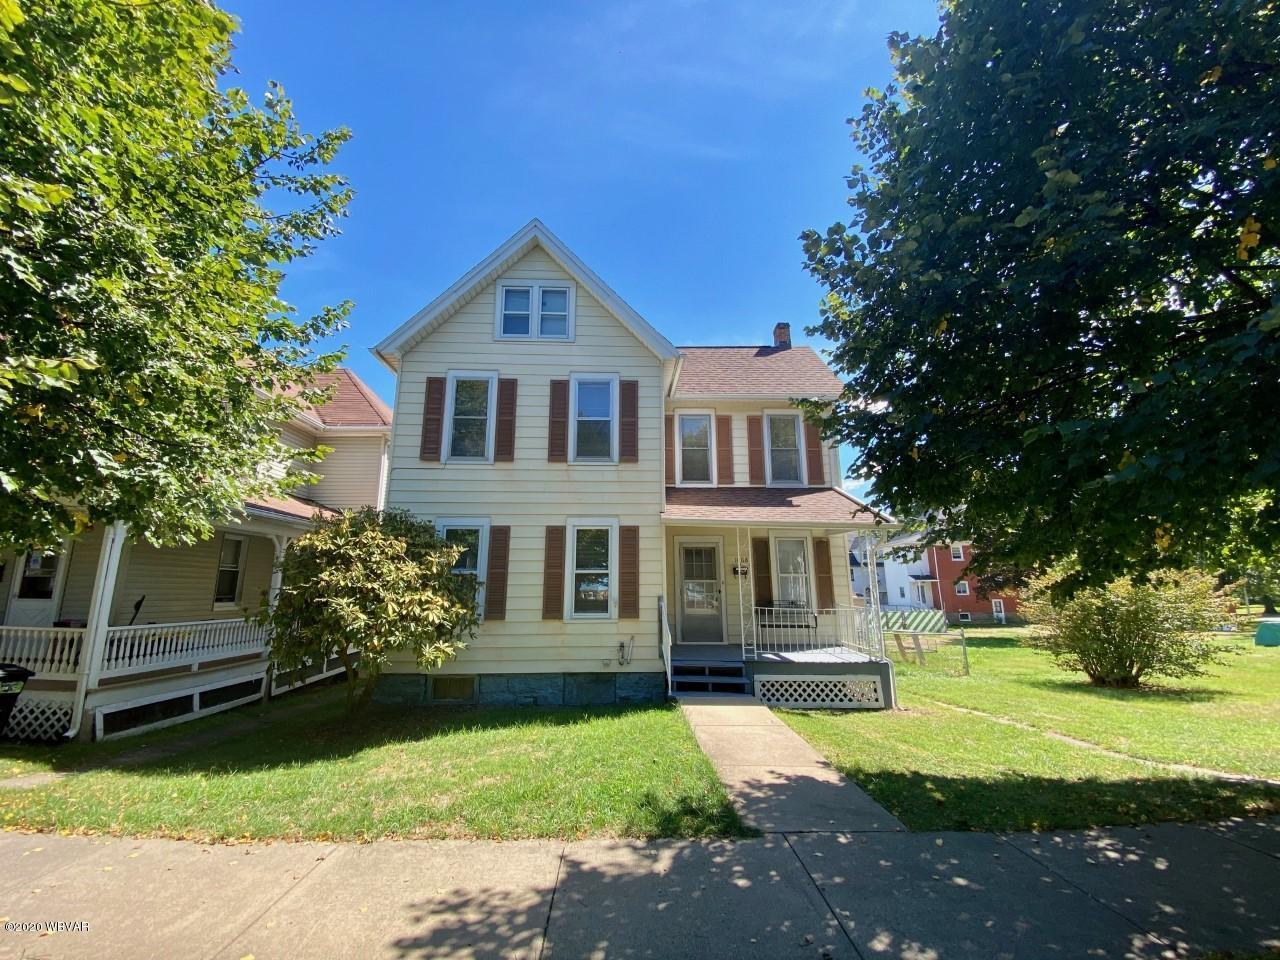 1008 BALDWIN STREET, Williamsport, PA 17701, 3 Bedrooms Bedrooms, ,1 BathroomBathrooms,Residential,For sale,BALDWIN,WB-90999